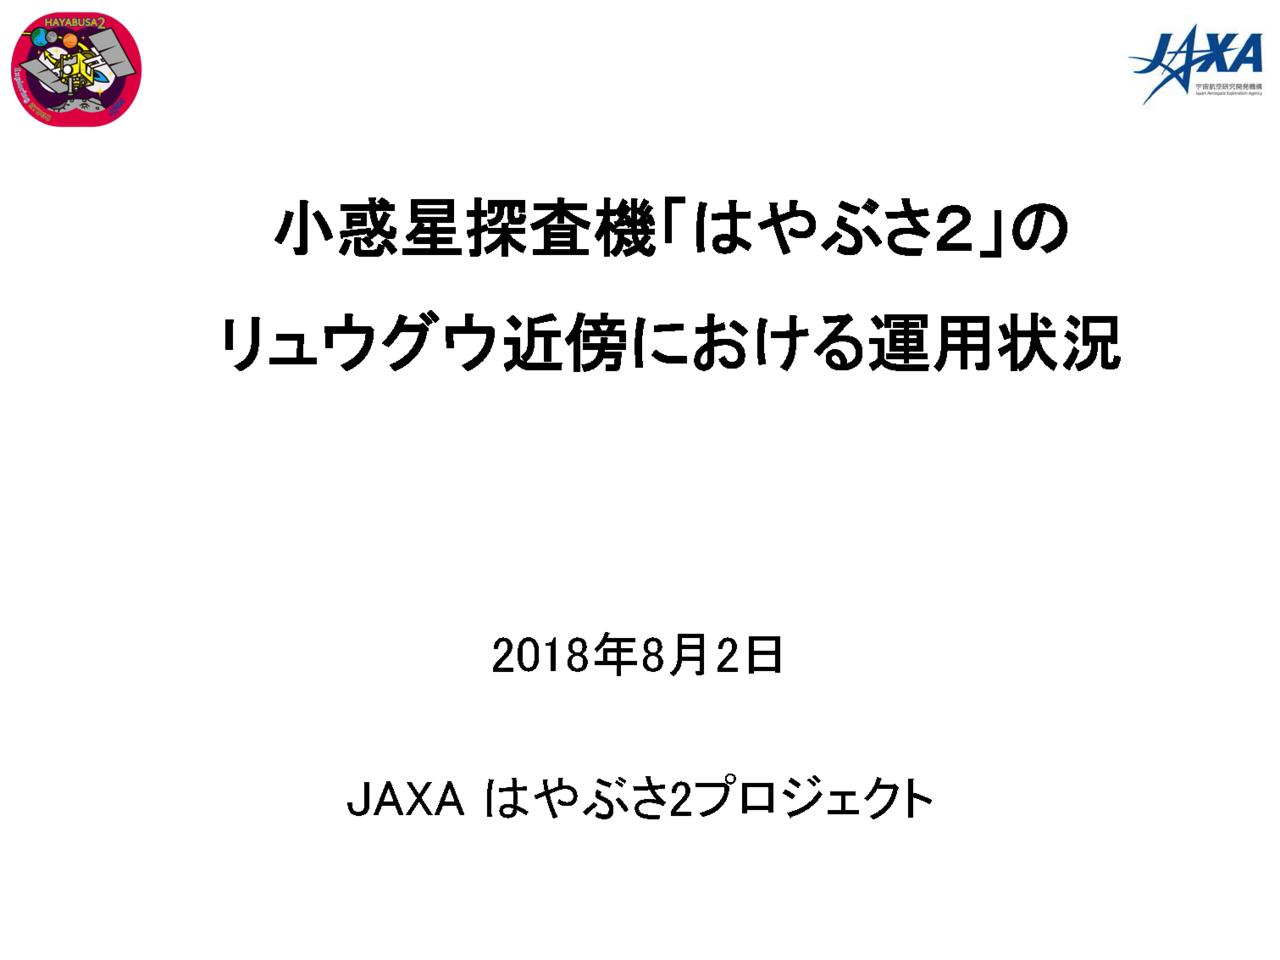 f:id:Imamura:20180802145921p:plain